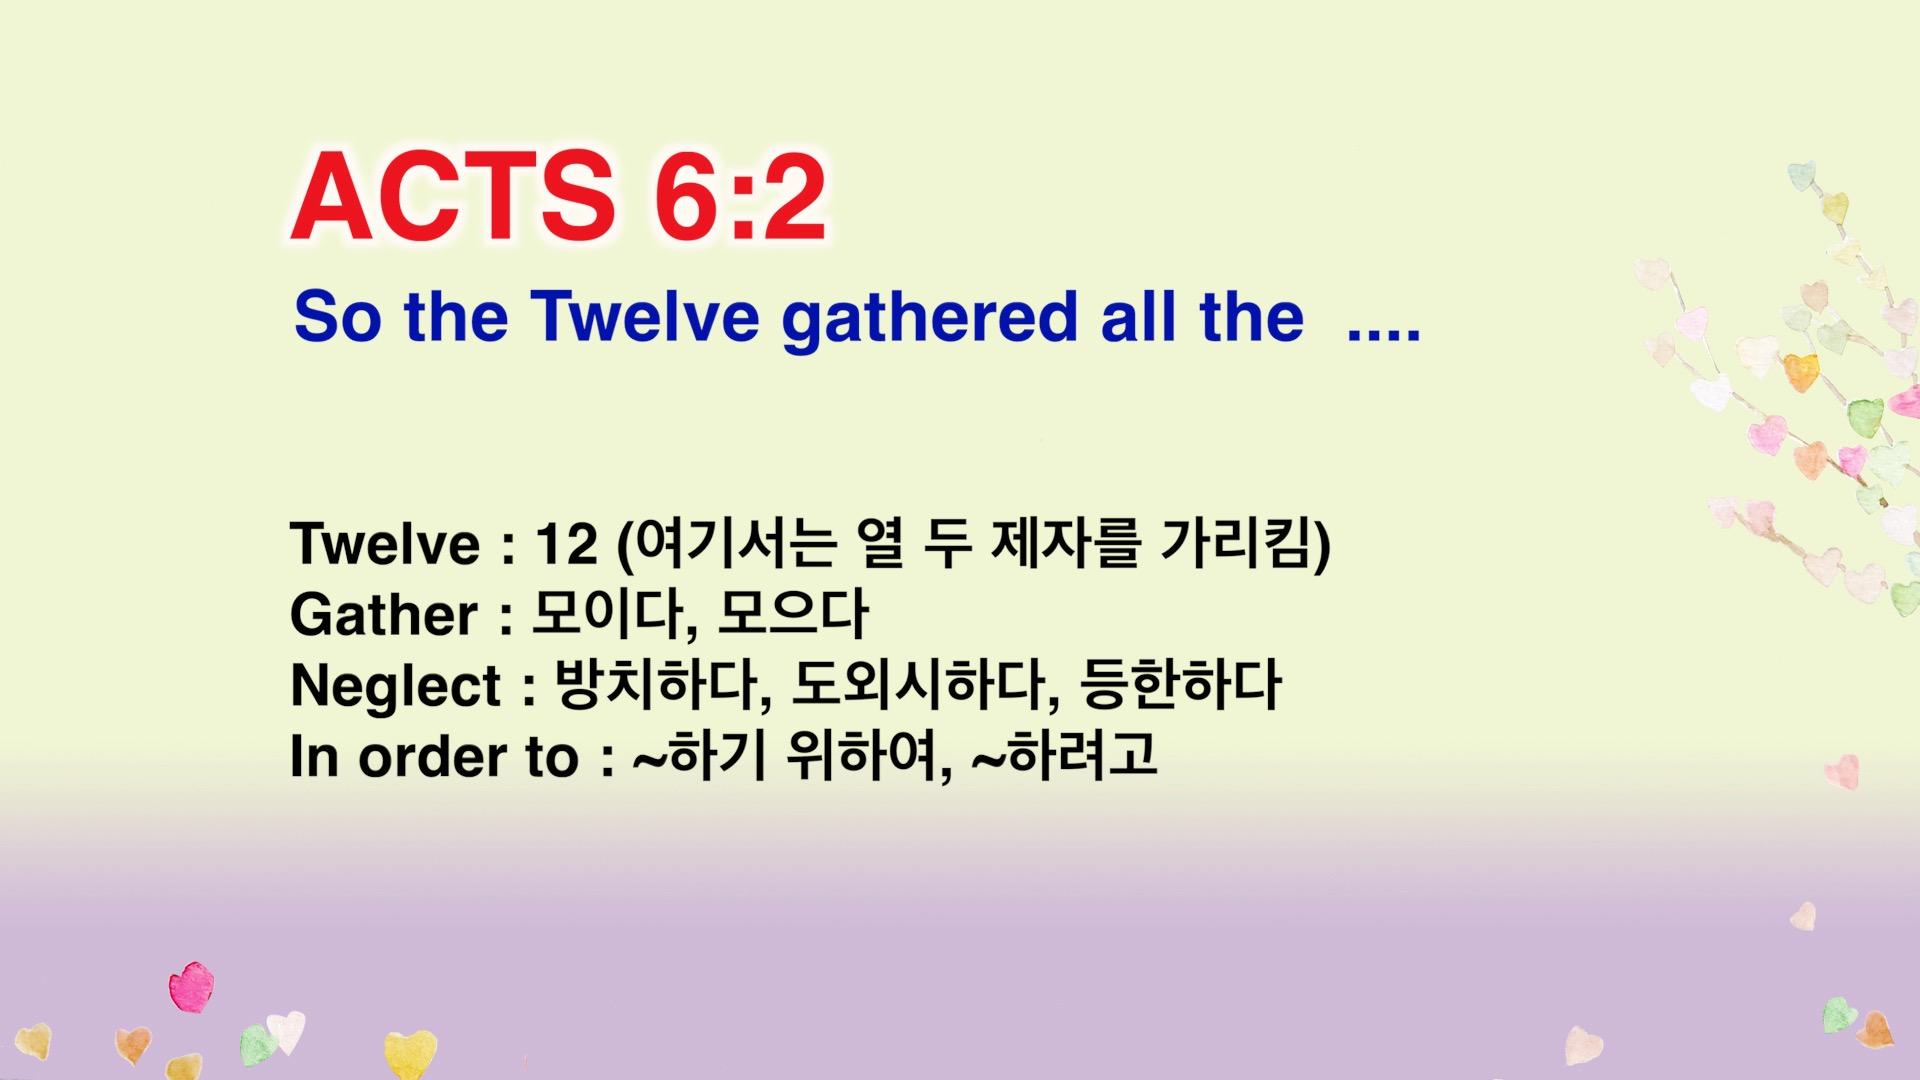 Leena's Bible English-Acts Chap. 6, Ver.2